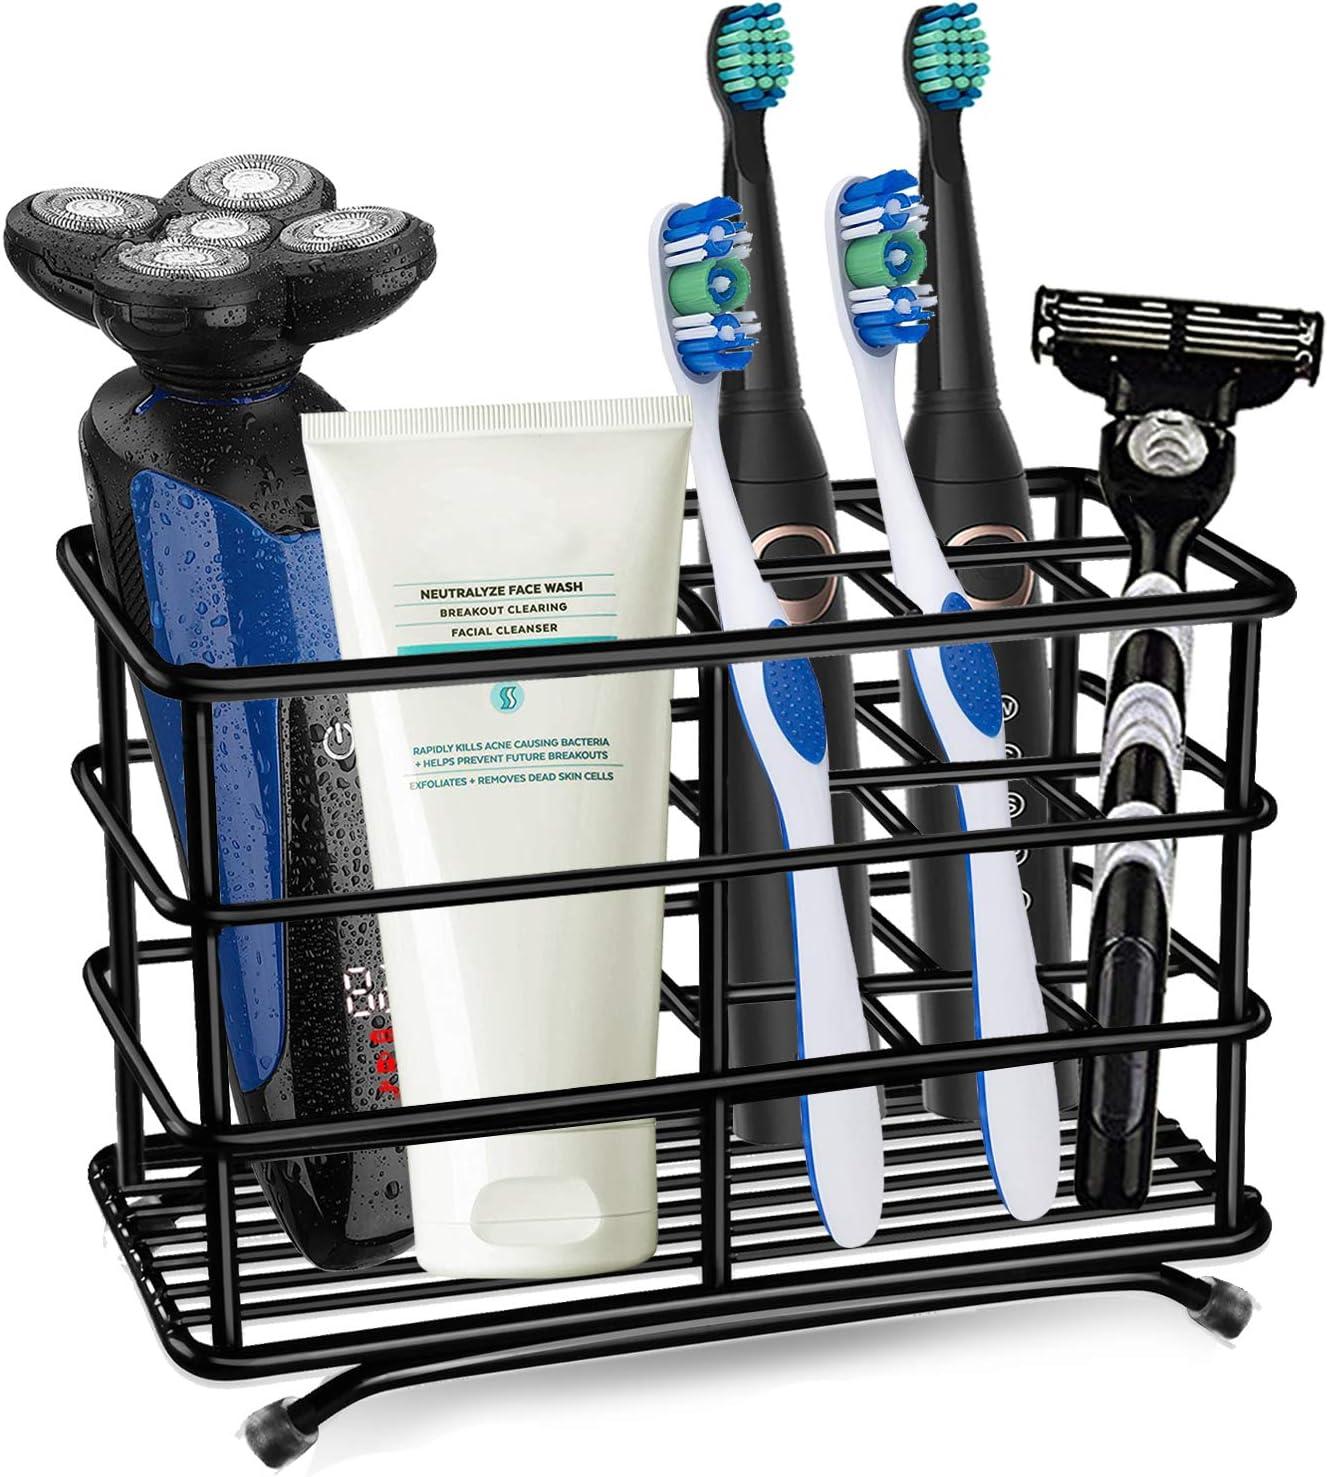 HYRIXDIRECT Toothbrush Holder Black Plating Stainless Steel Rustproof Bathroom Electric Toothbrush Holder Toothpaste Storage Organizer Multi-Functional 6 Slots Stand for Vanity,Countertops Black-01